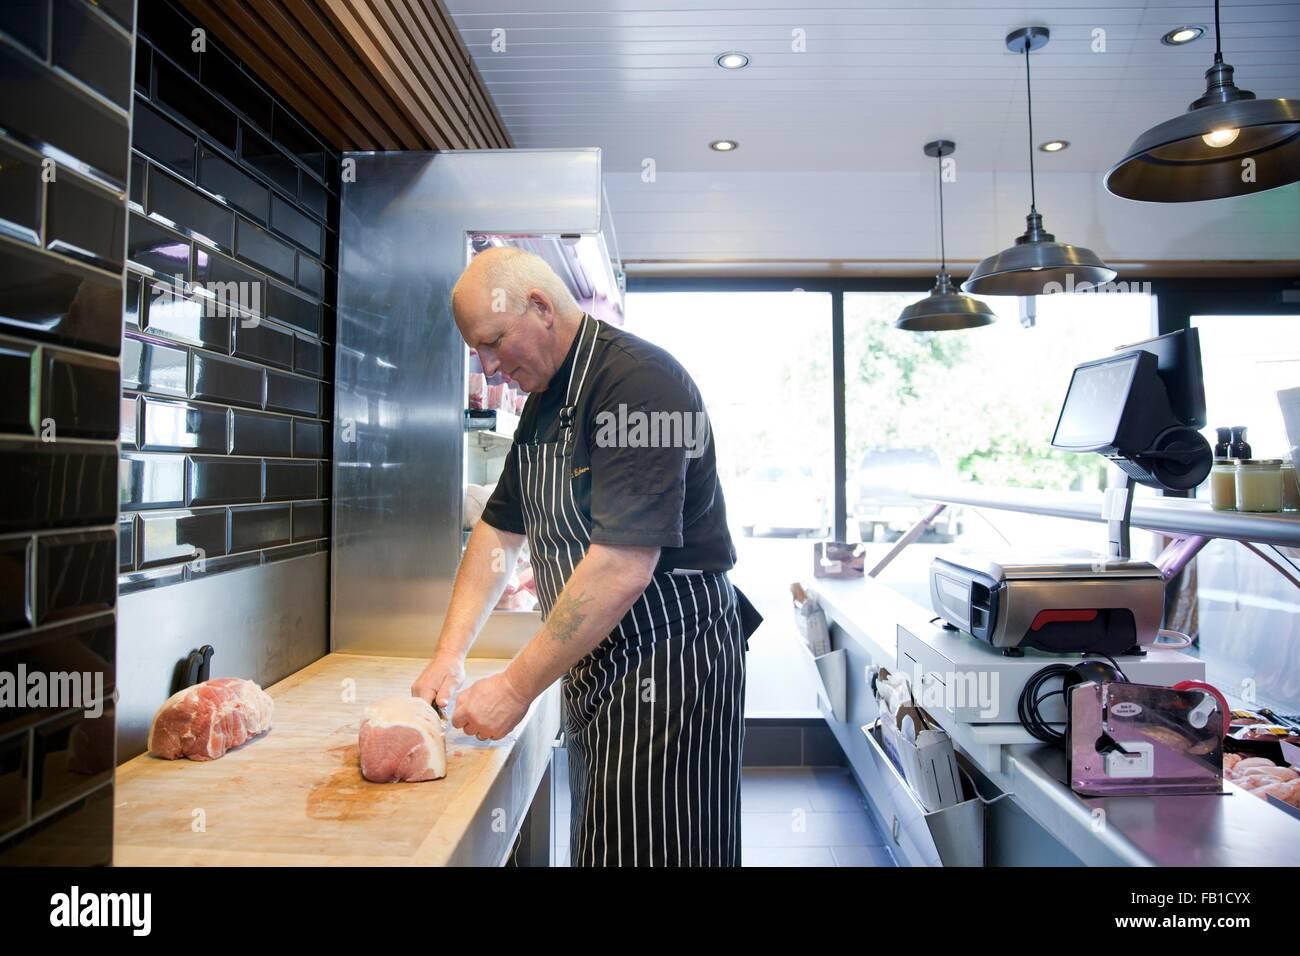 Mature butcher preparing meat in butchers shop - Stock Image